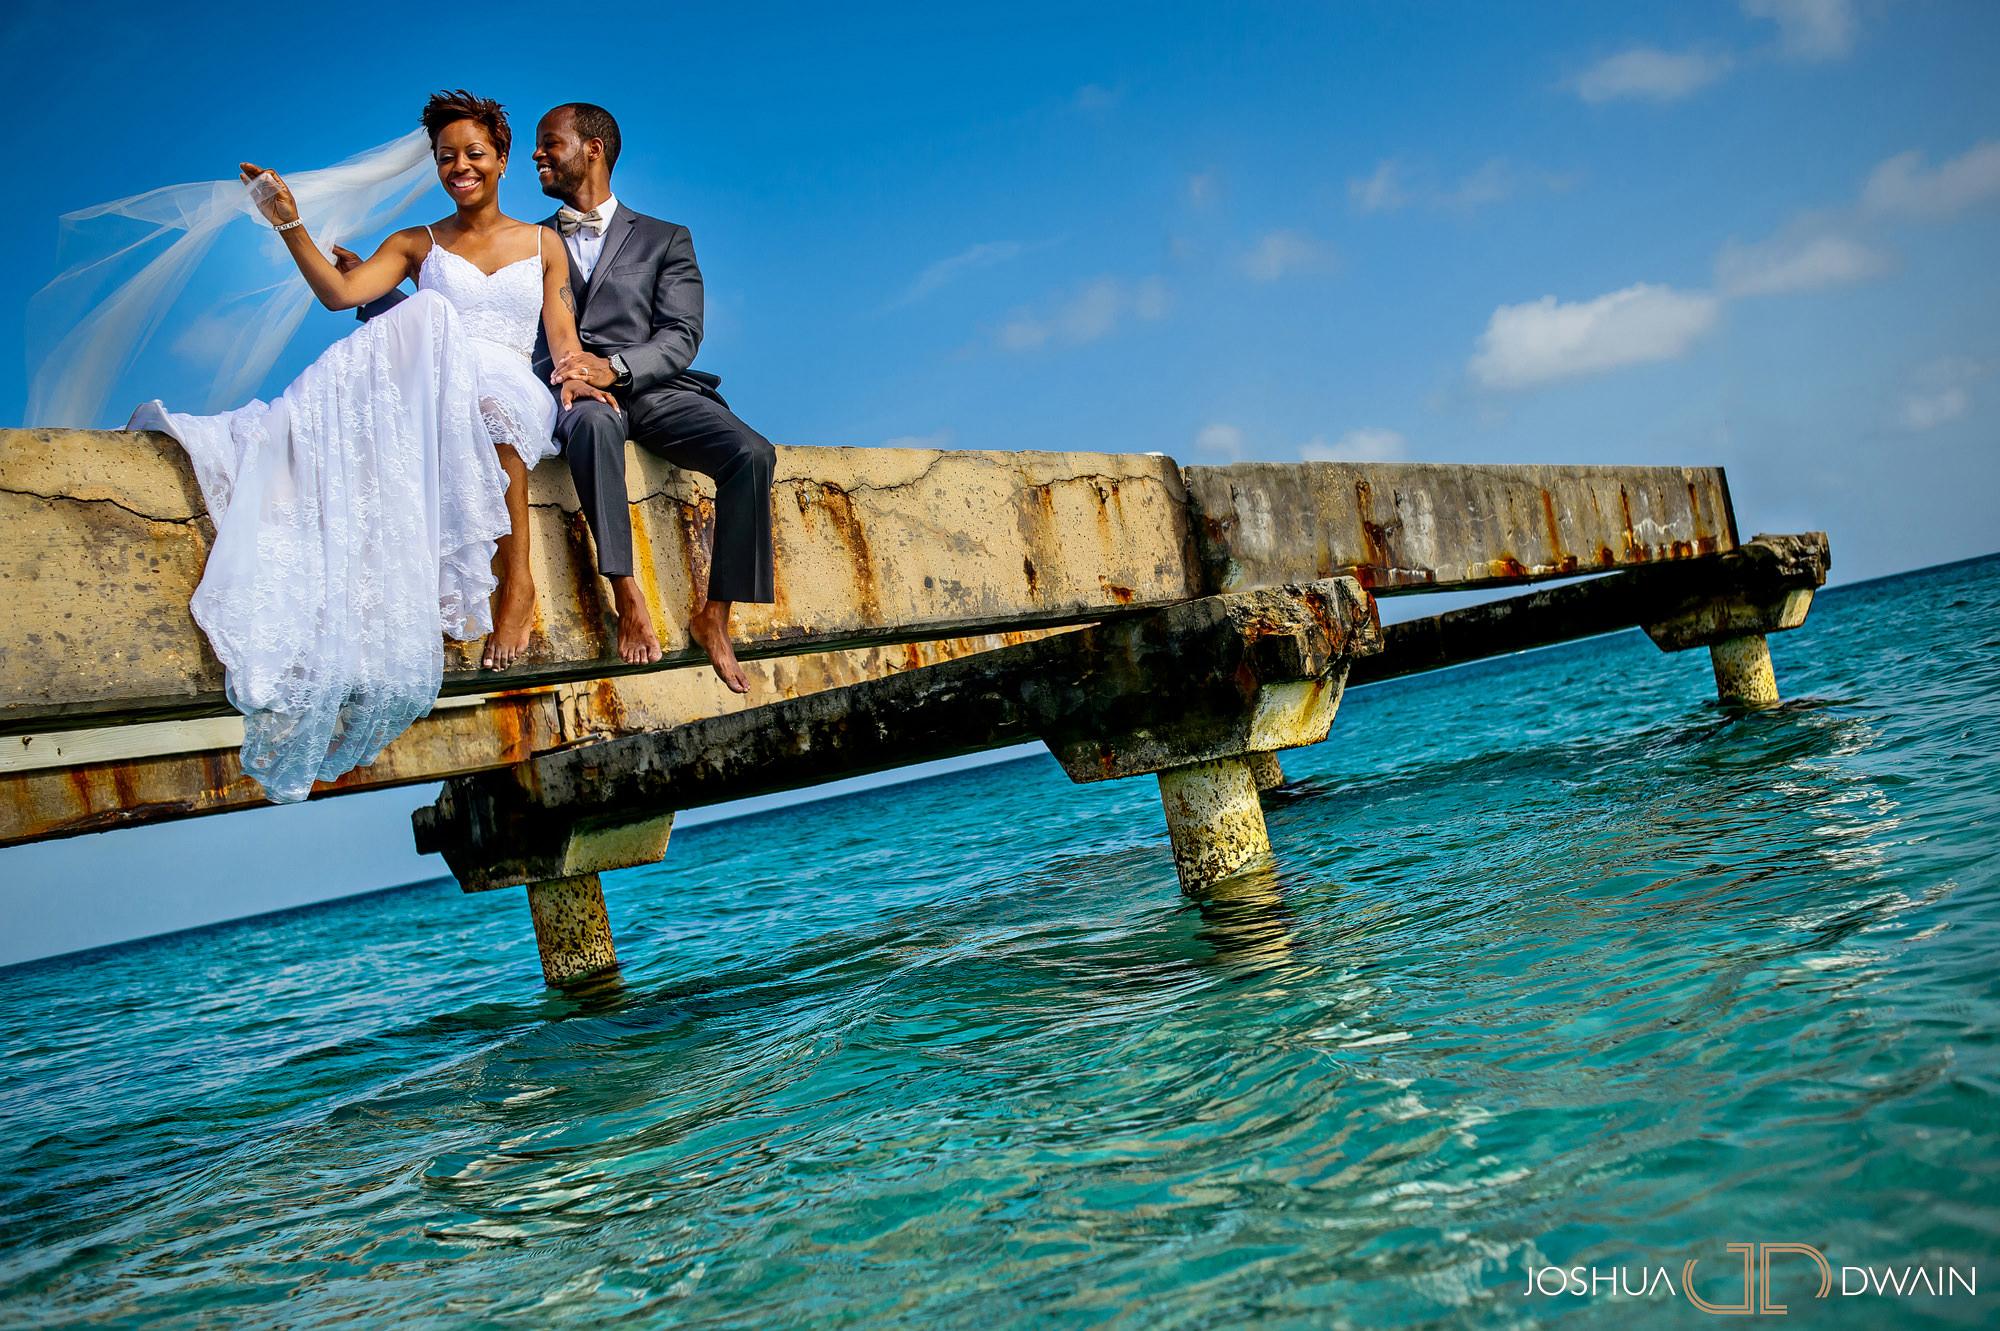 joshua-dwain-weddings-gallery-best-wedding-photographers-us-041